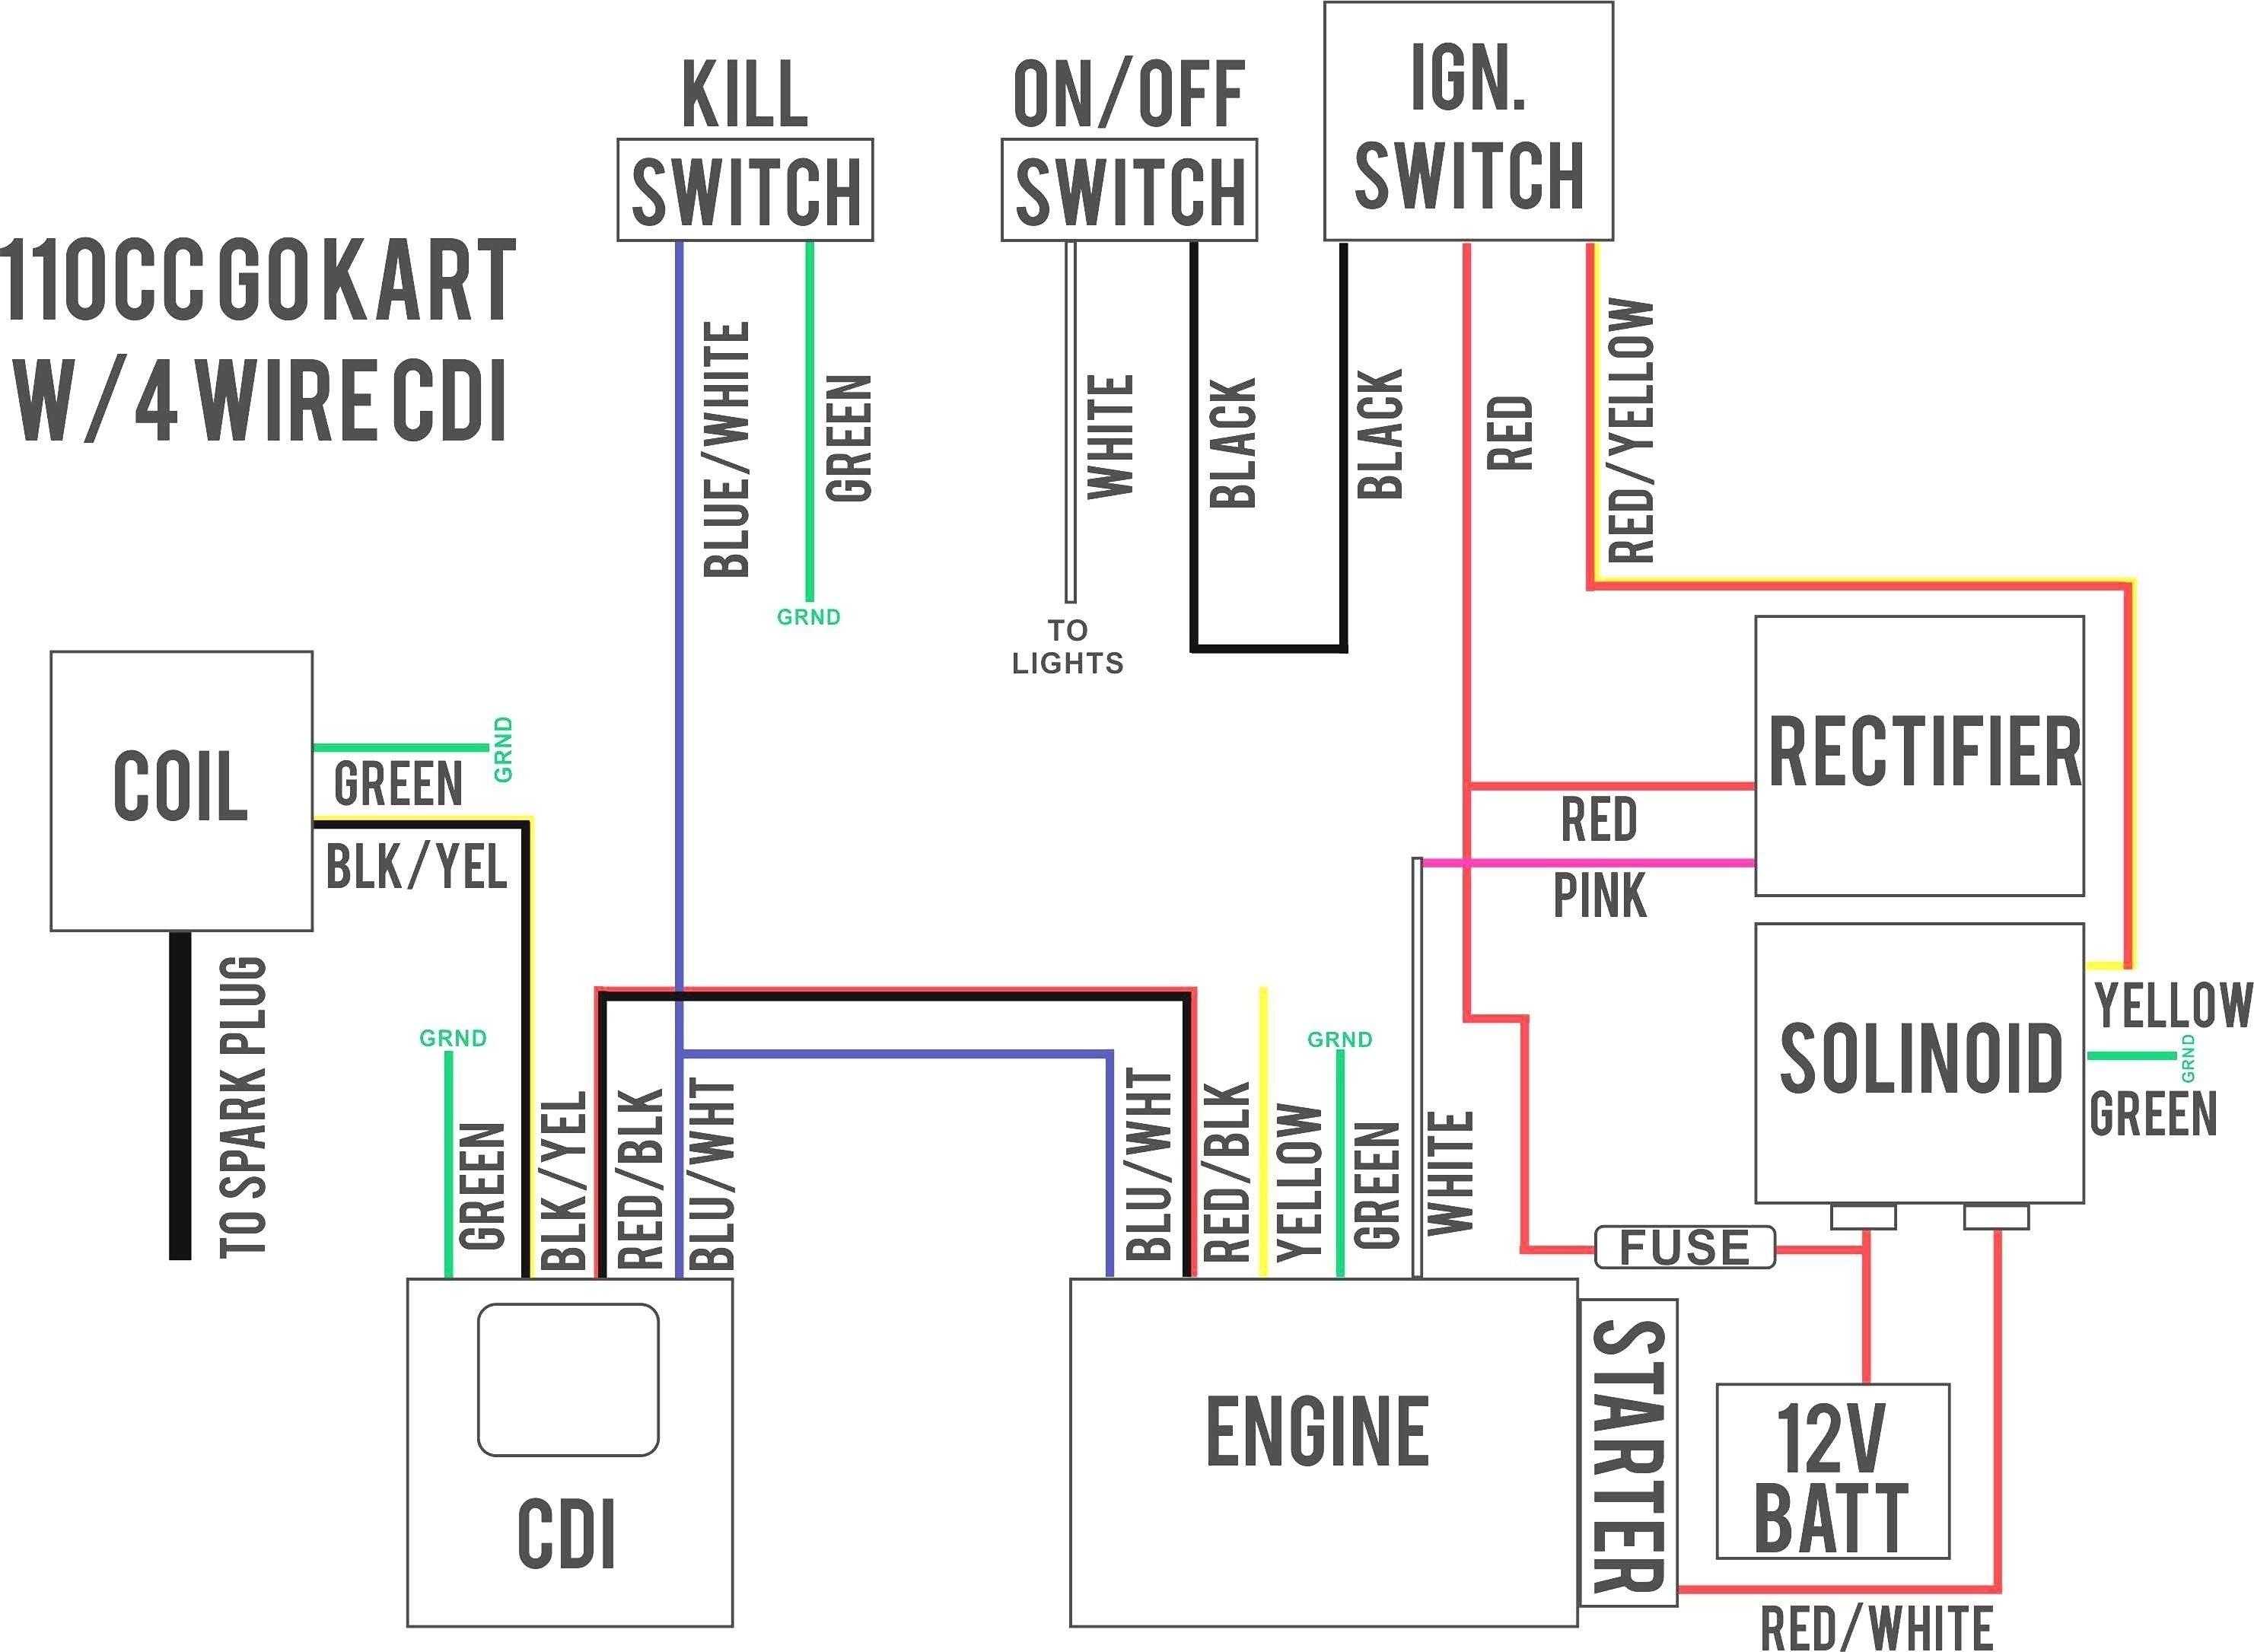 New 2002 Dodge Ram 1500 Alarm Wiring Diagram Electrical Wiring Diagram Motorcycle Wiring Electrical Diagram